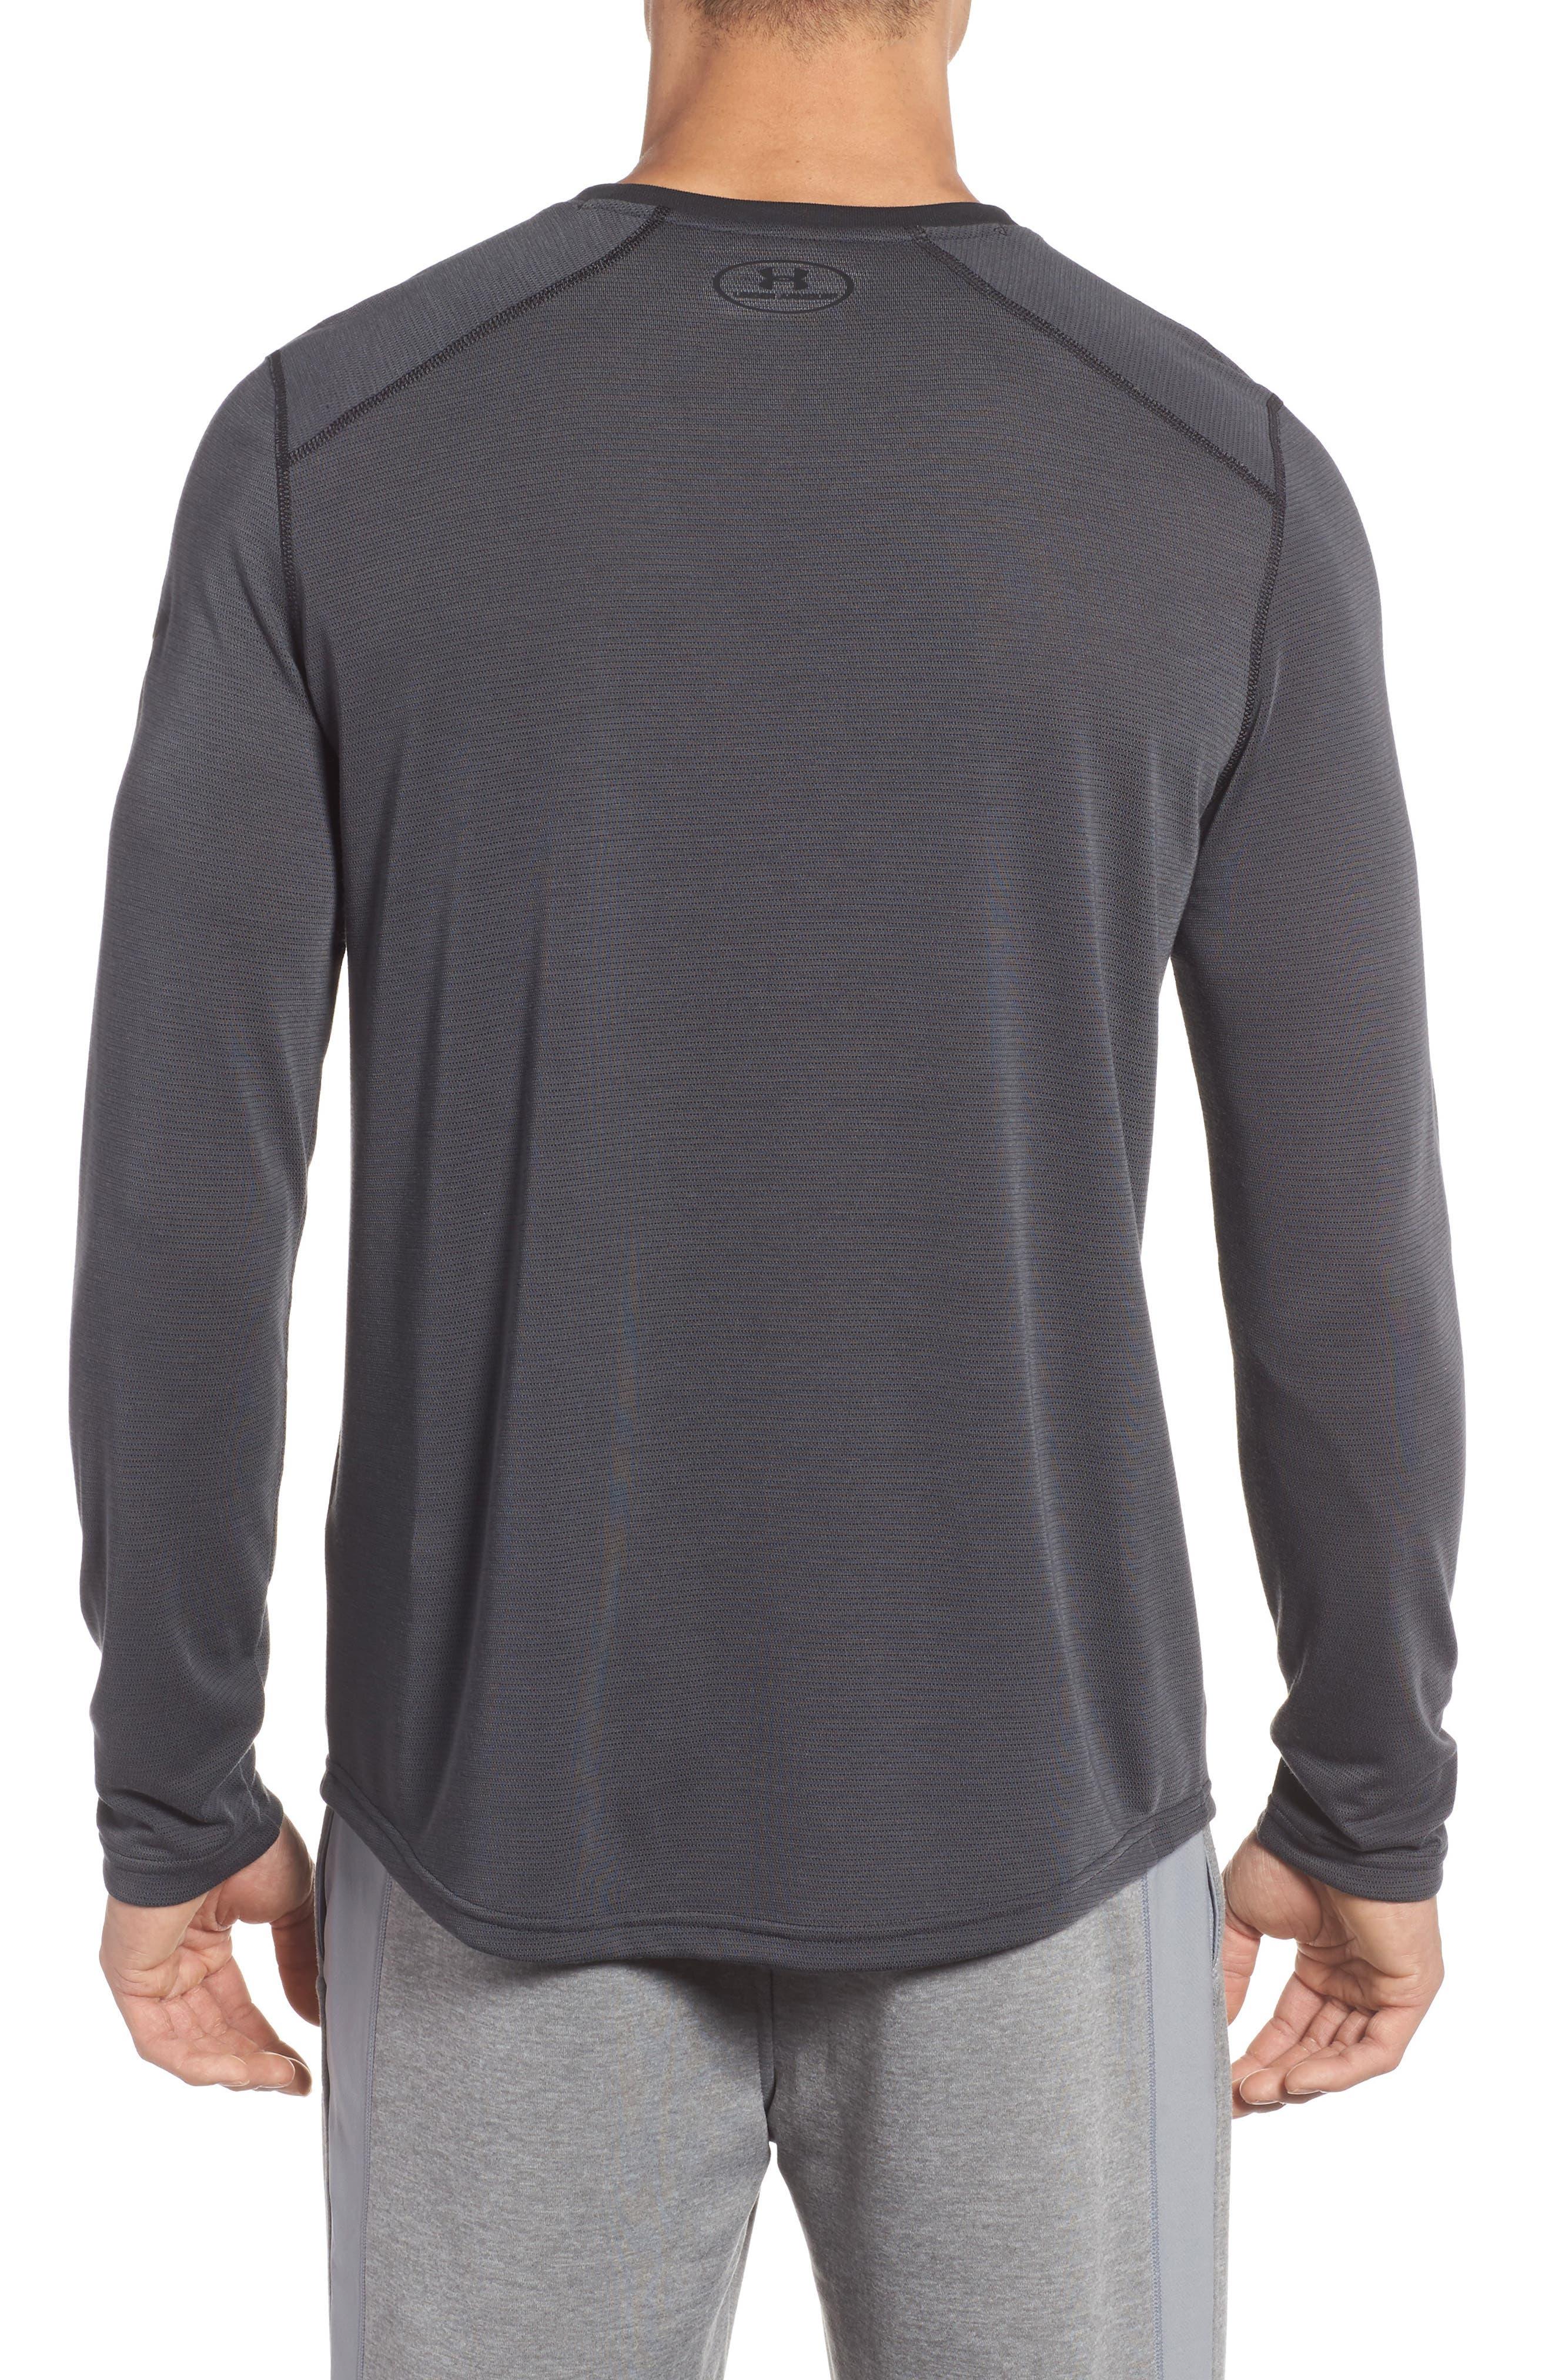 Threadborne Performance T-Shirt,                             Alternate thumbnail 2, color,                             020